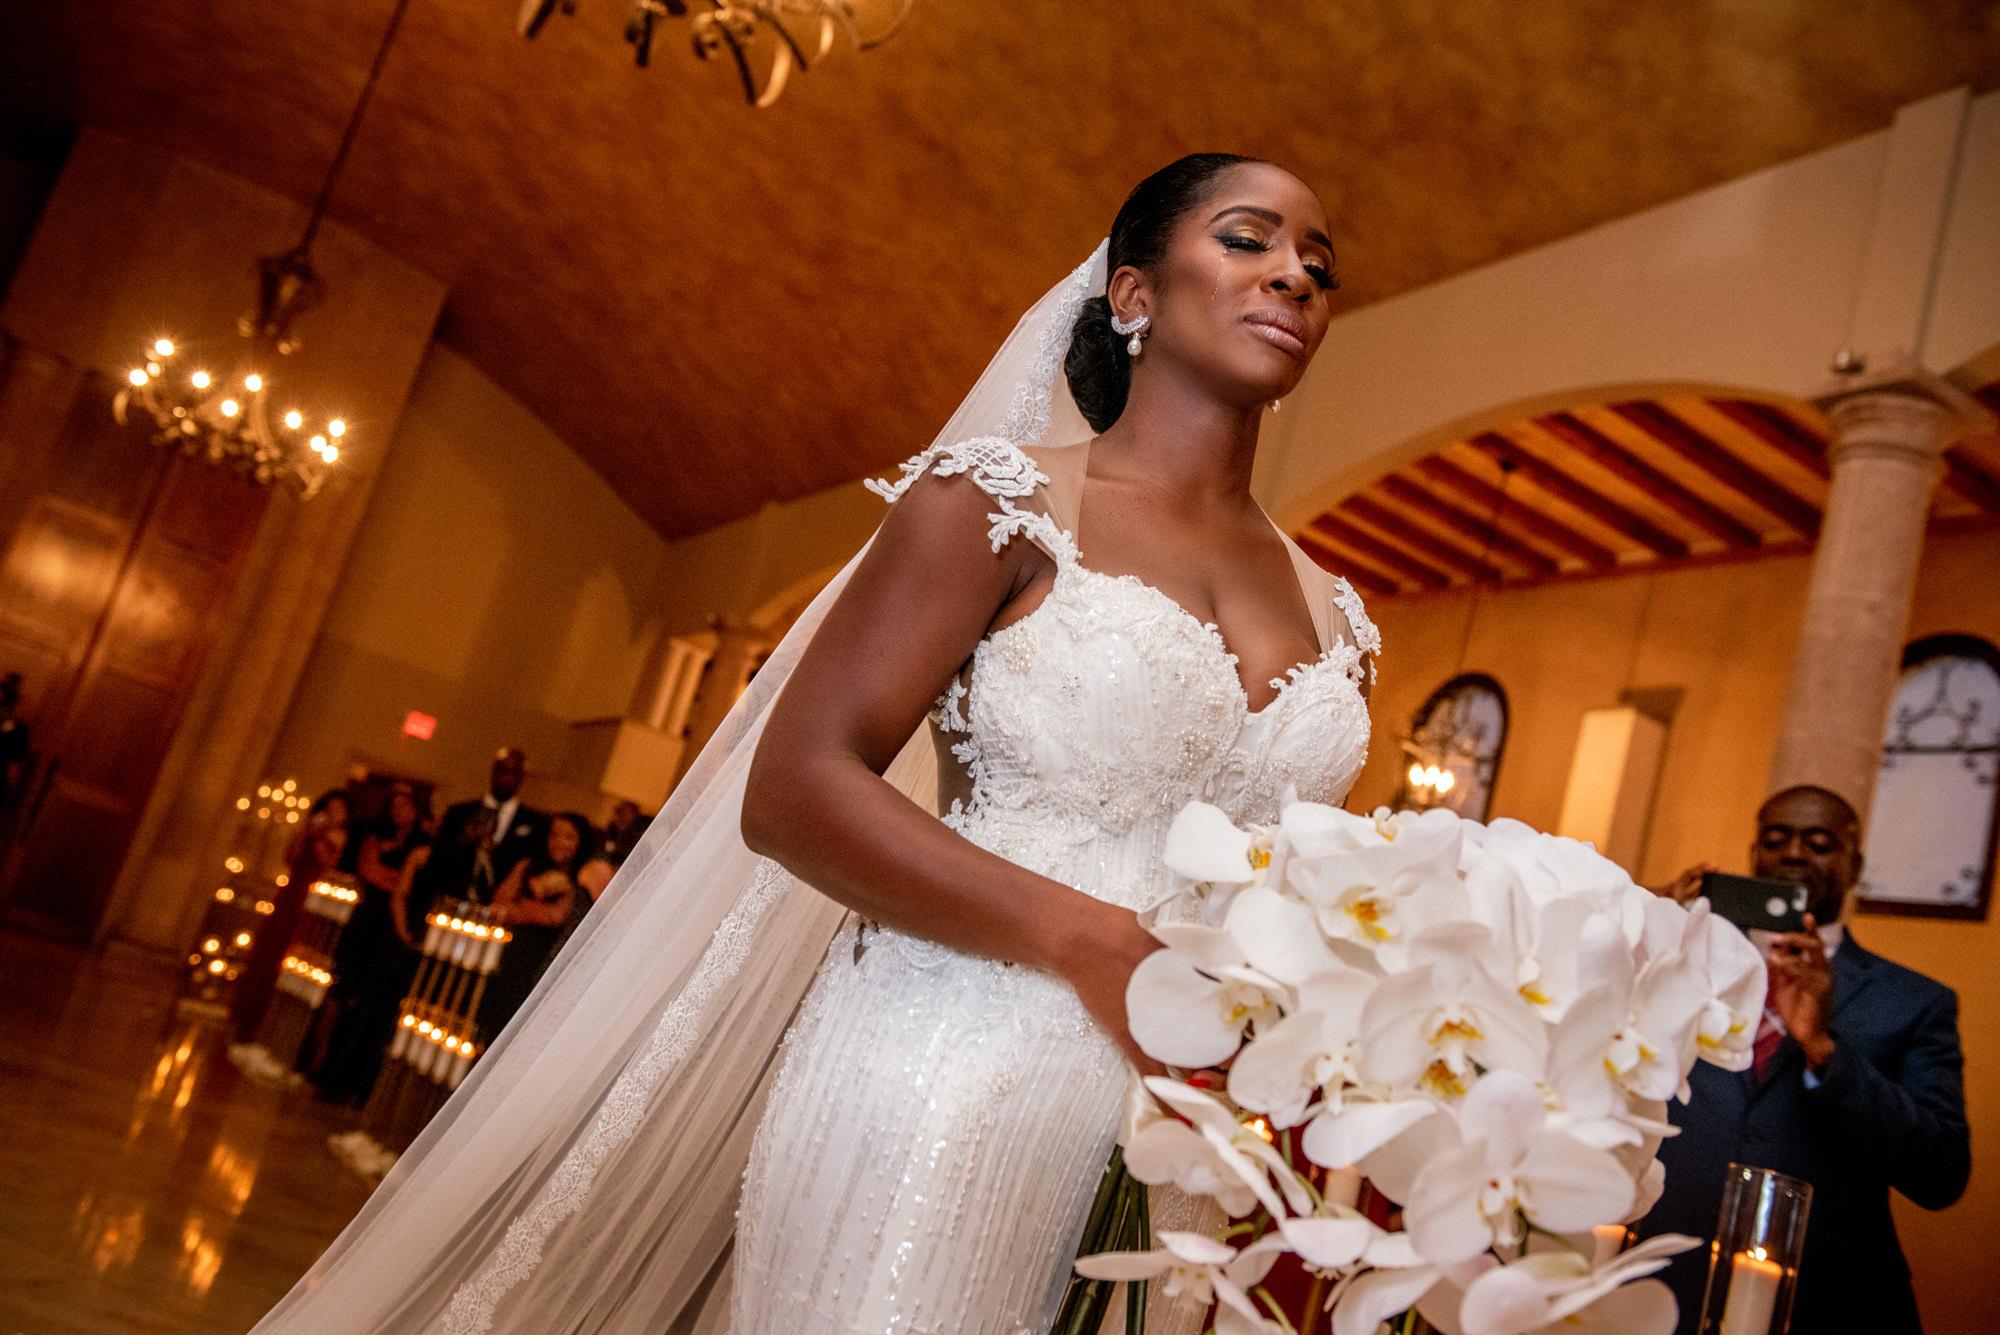 Bride walks down aisle - Morgan Lynn Photography